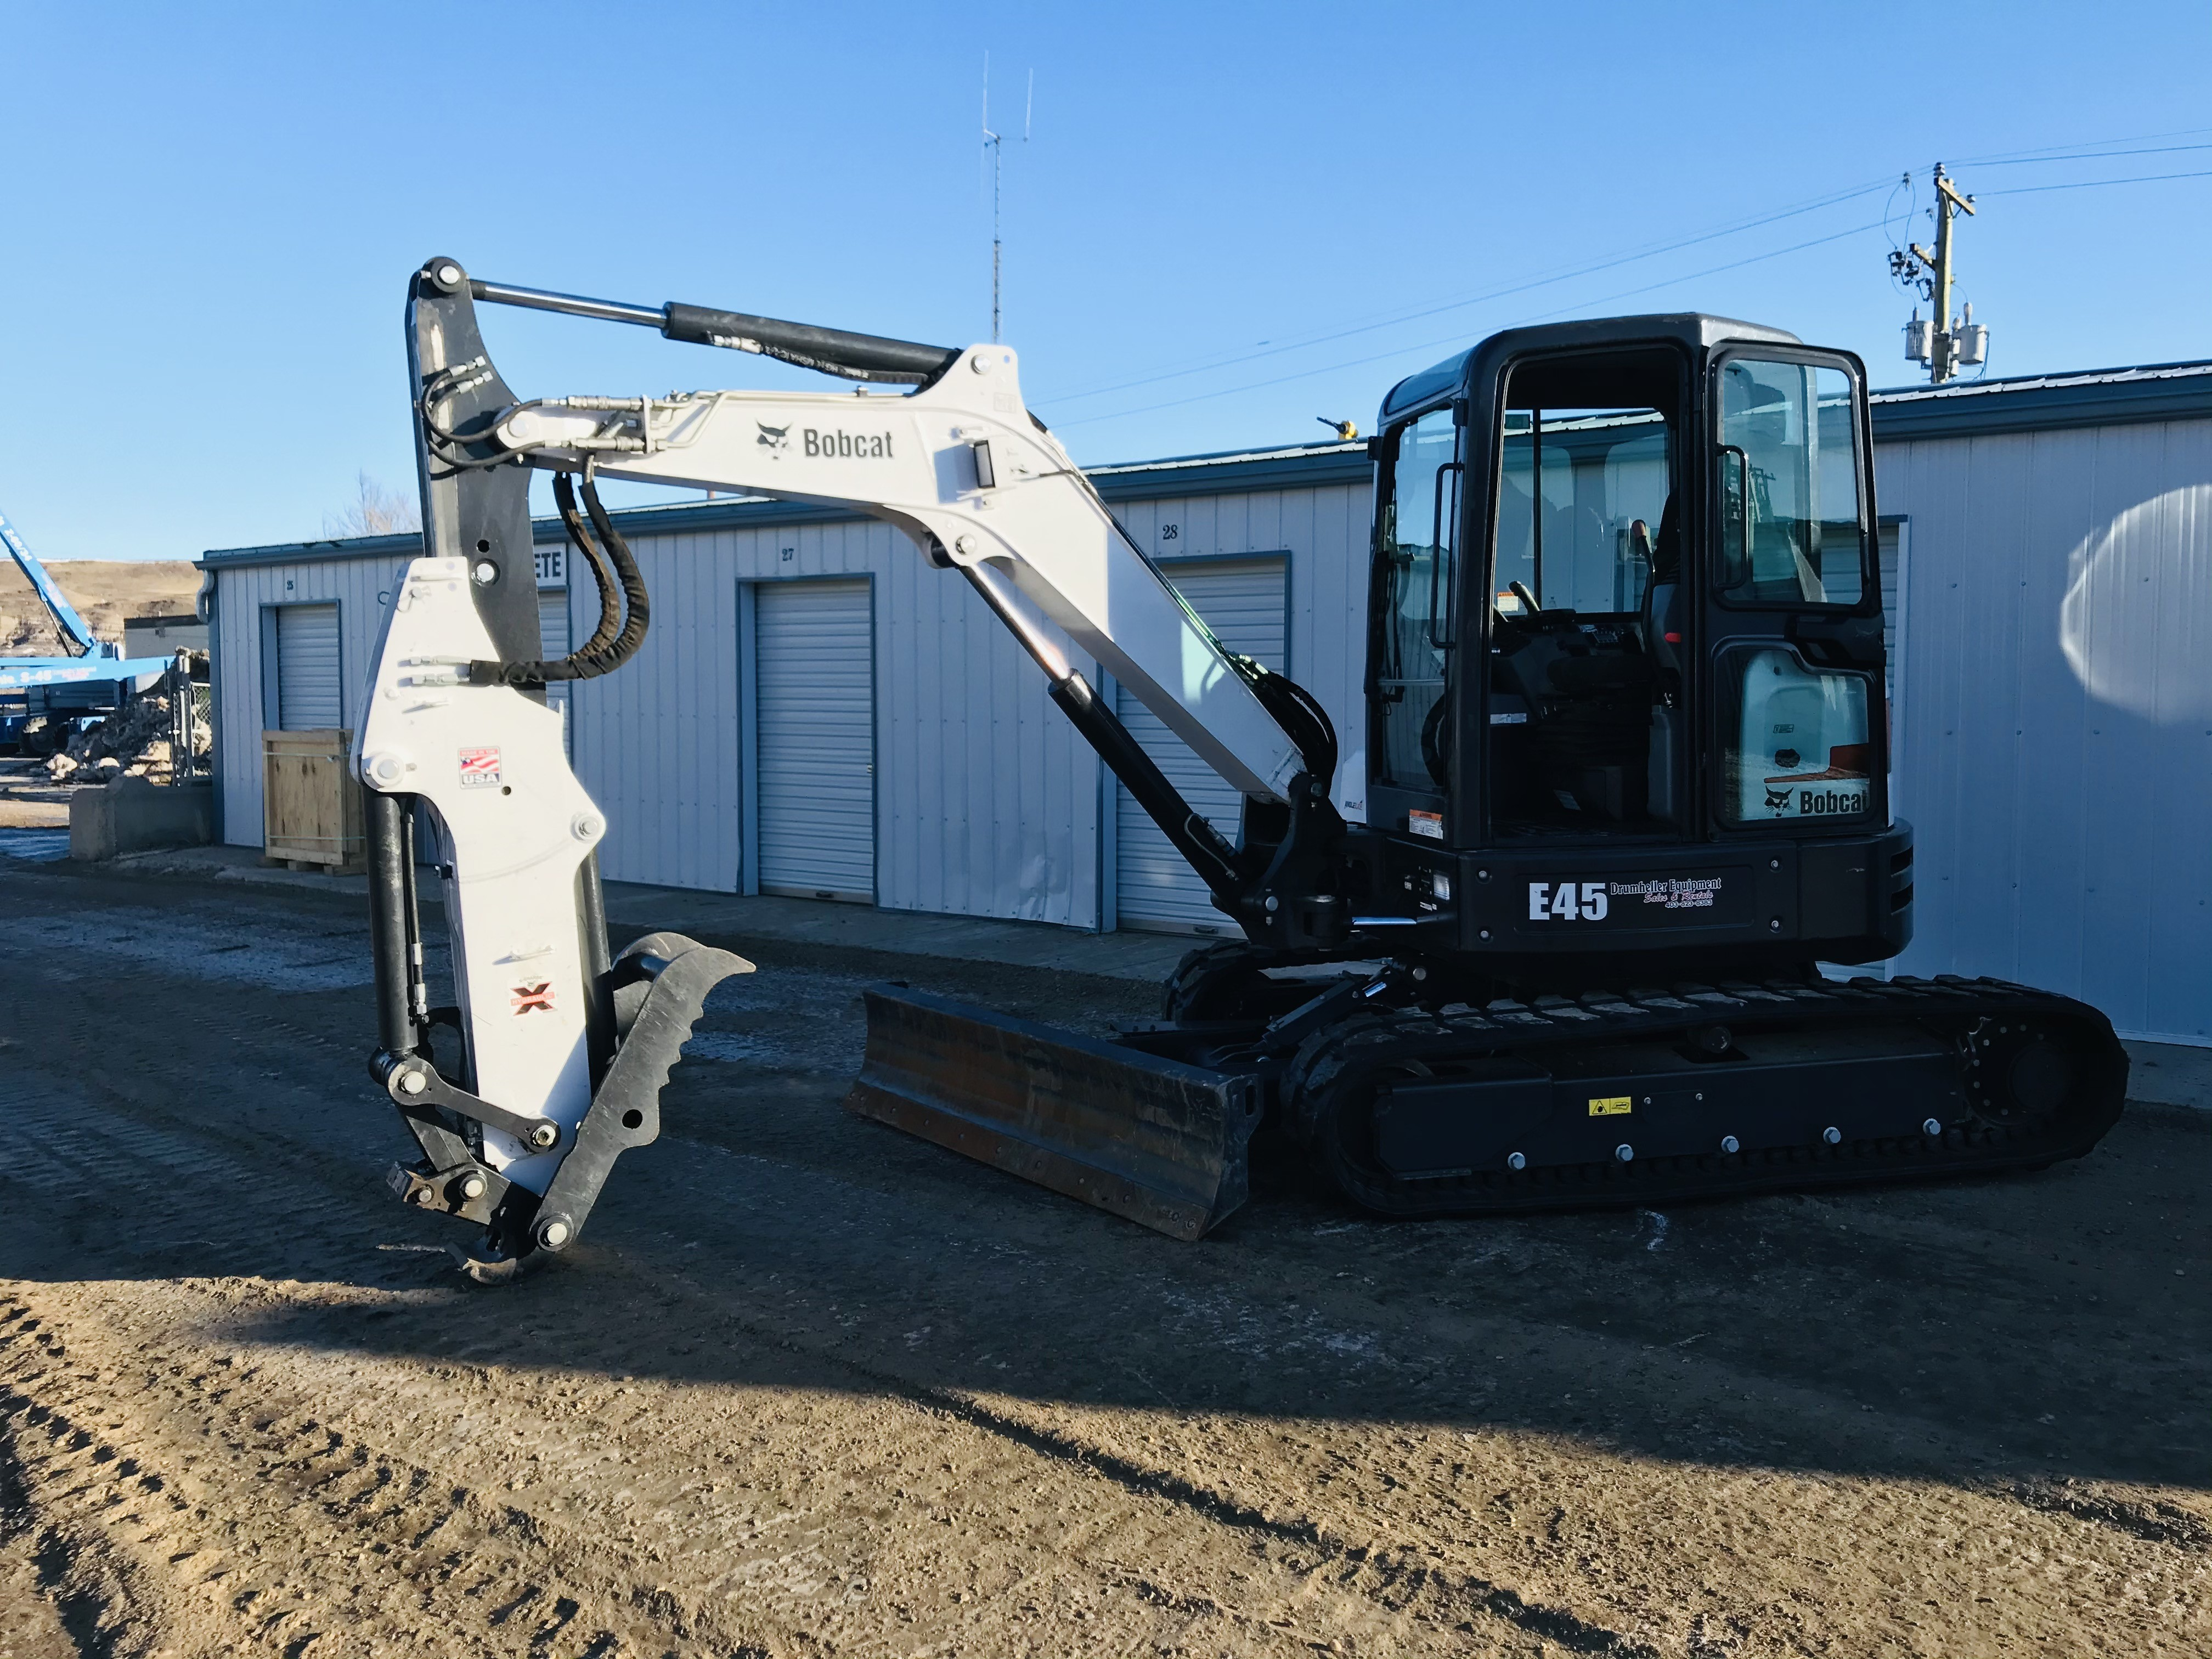 Used, 2019, Bobcat, E45 Extendable Arm, Excavators